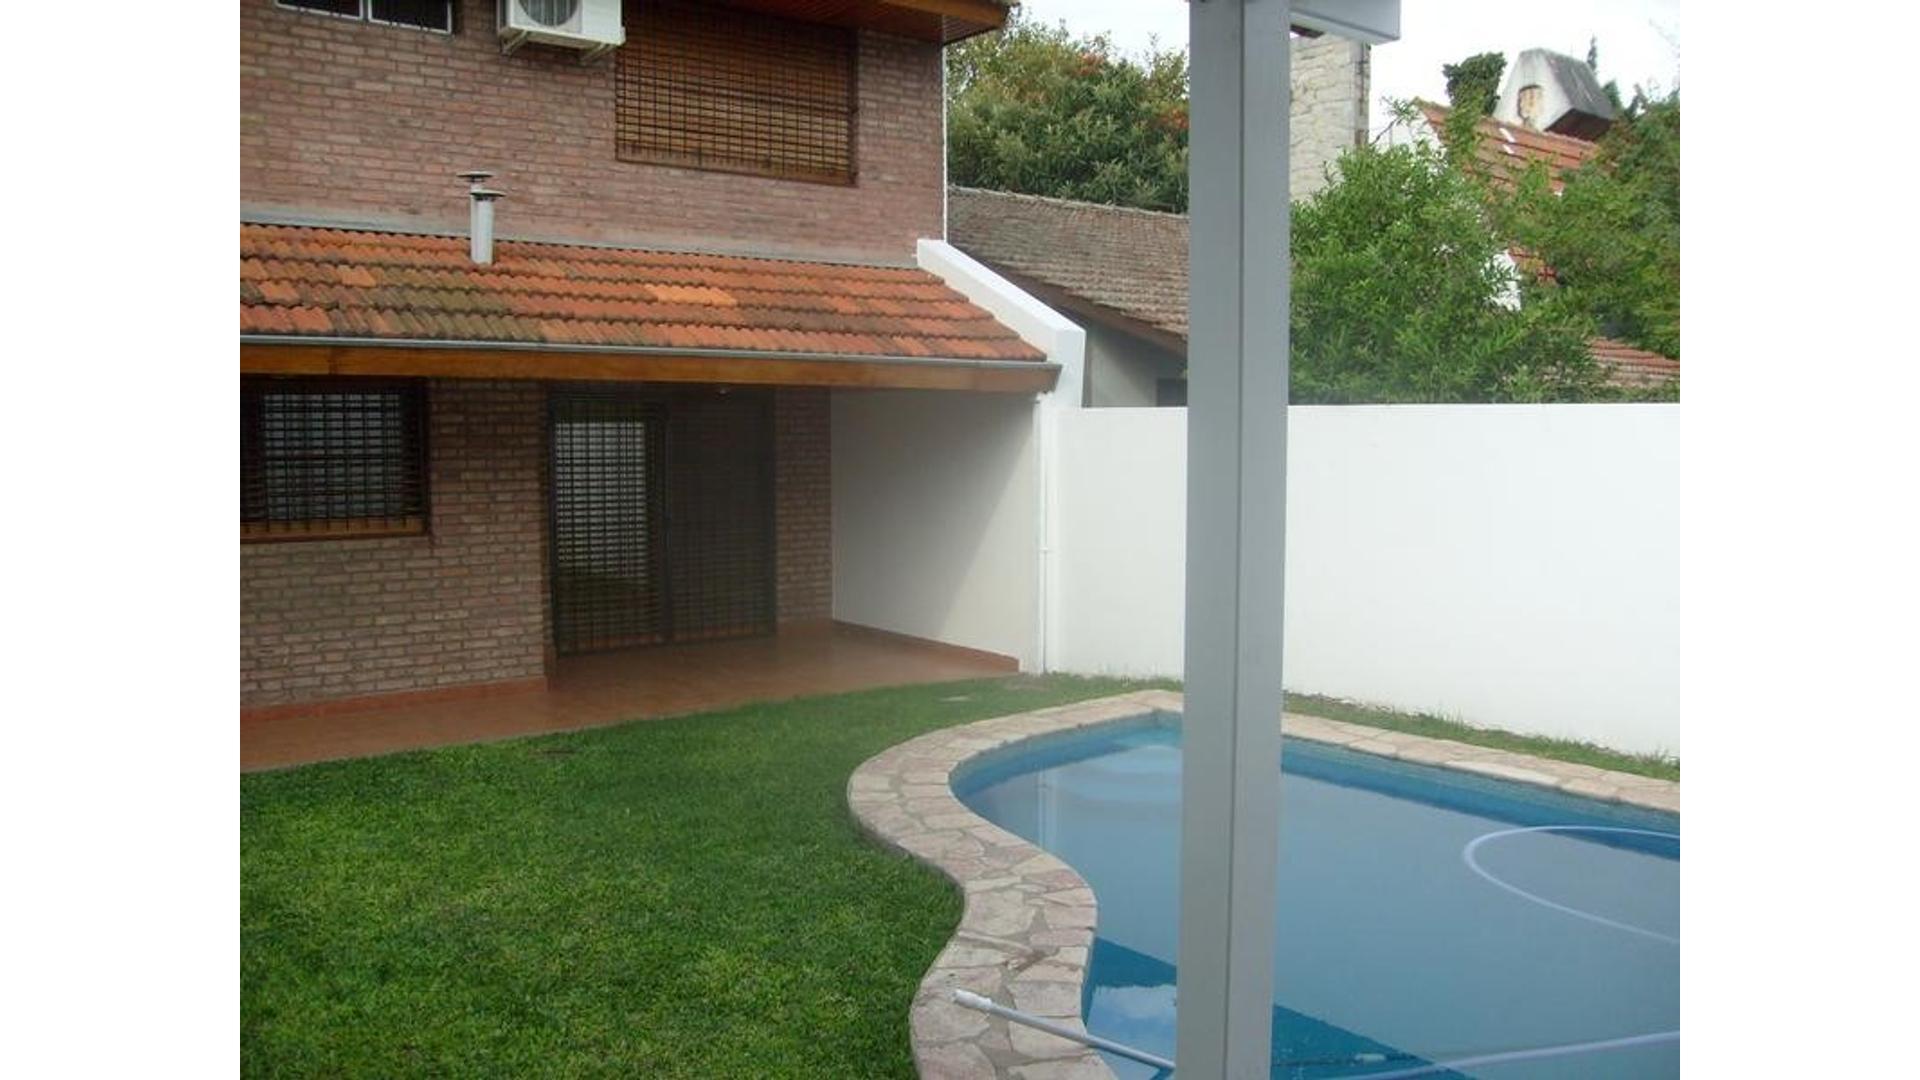 Chalet 6amb c/jardín, piscina y parrilla, a 2 cuadras de Av. Santa Fe